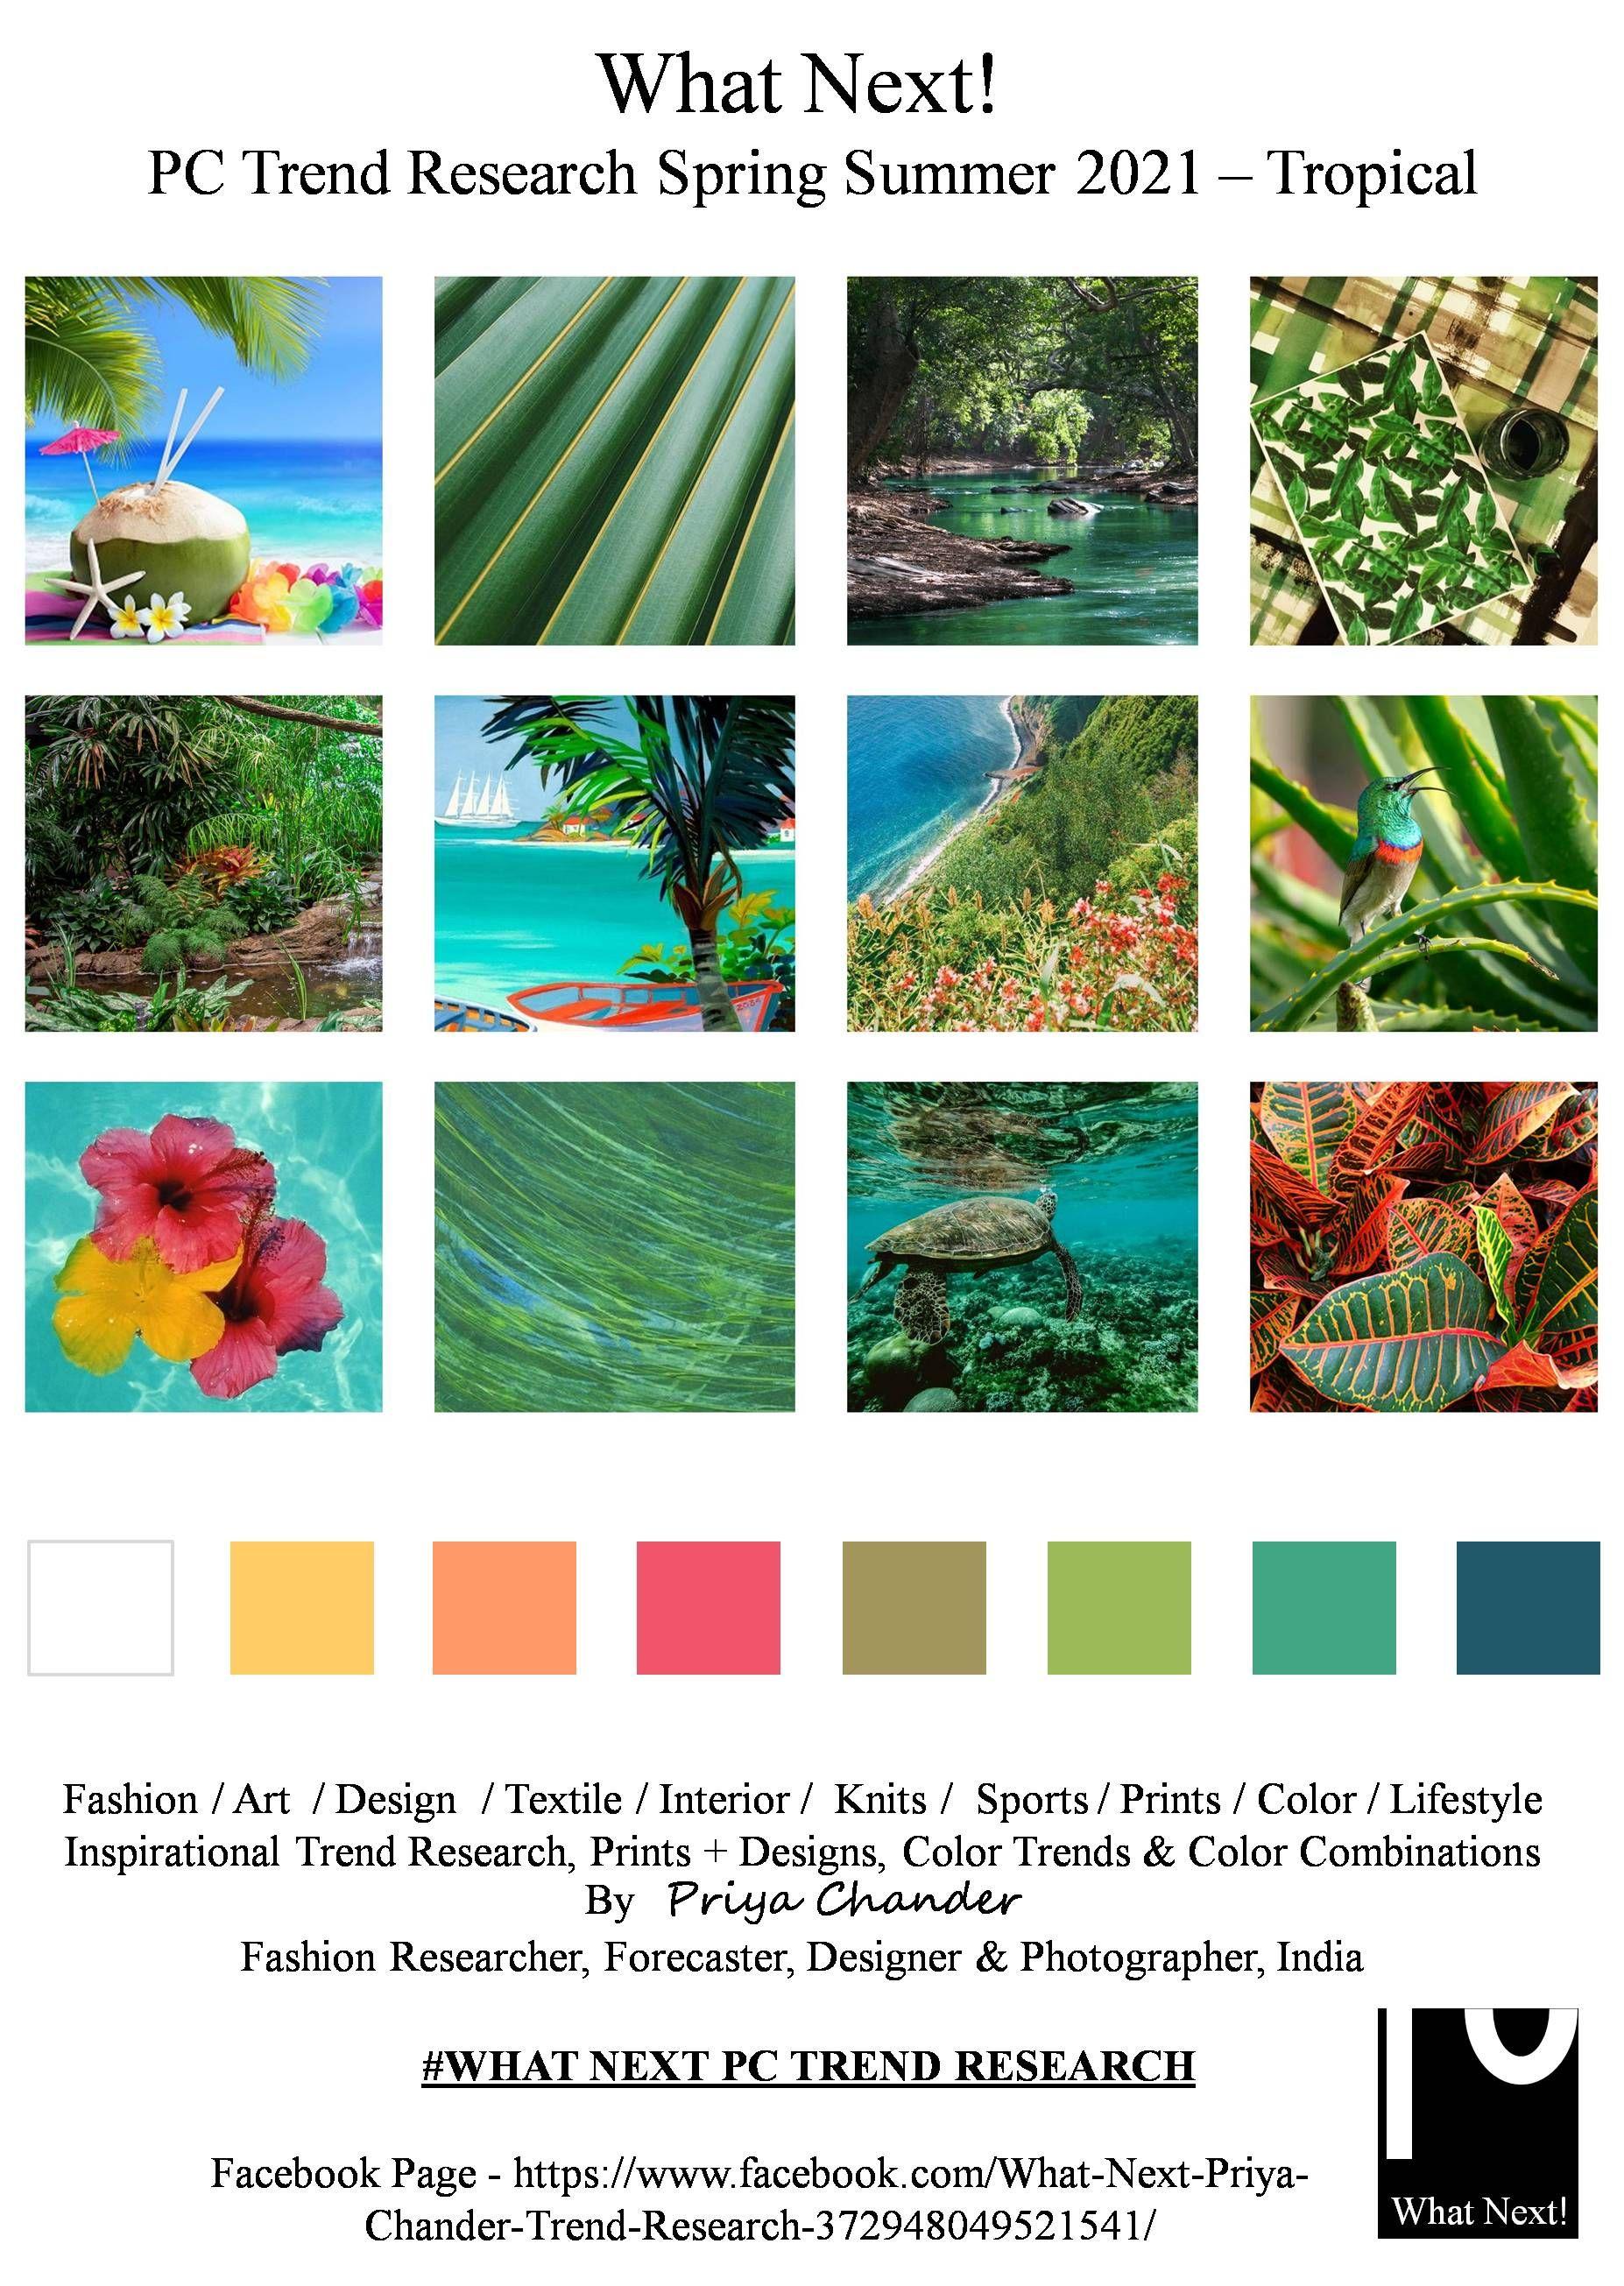 #Tropical #tropics #SS2021 #WhatNextPCTrendResearch #PriyaChanderDesigns